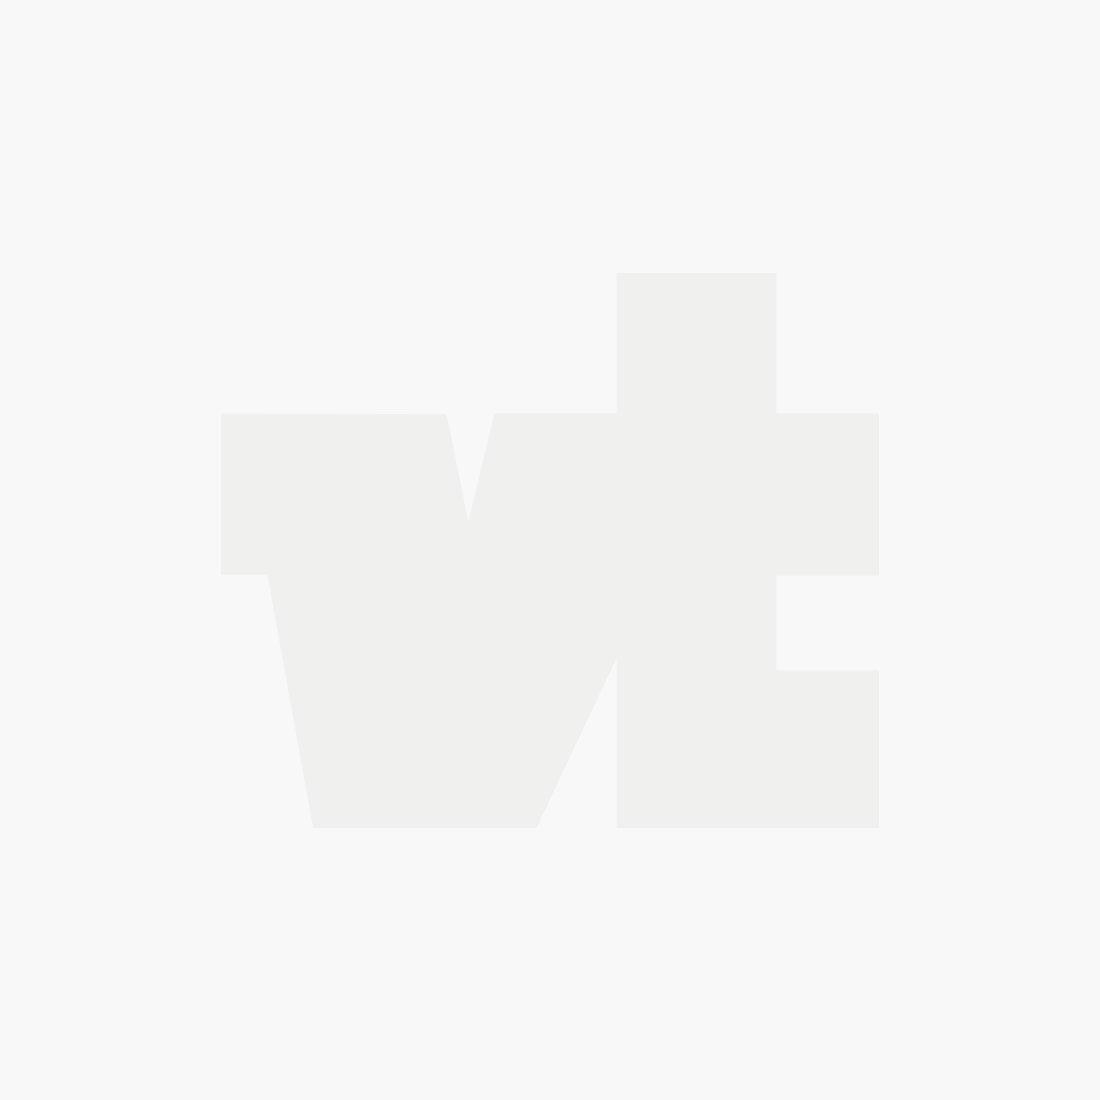 Jumper yellow